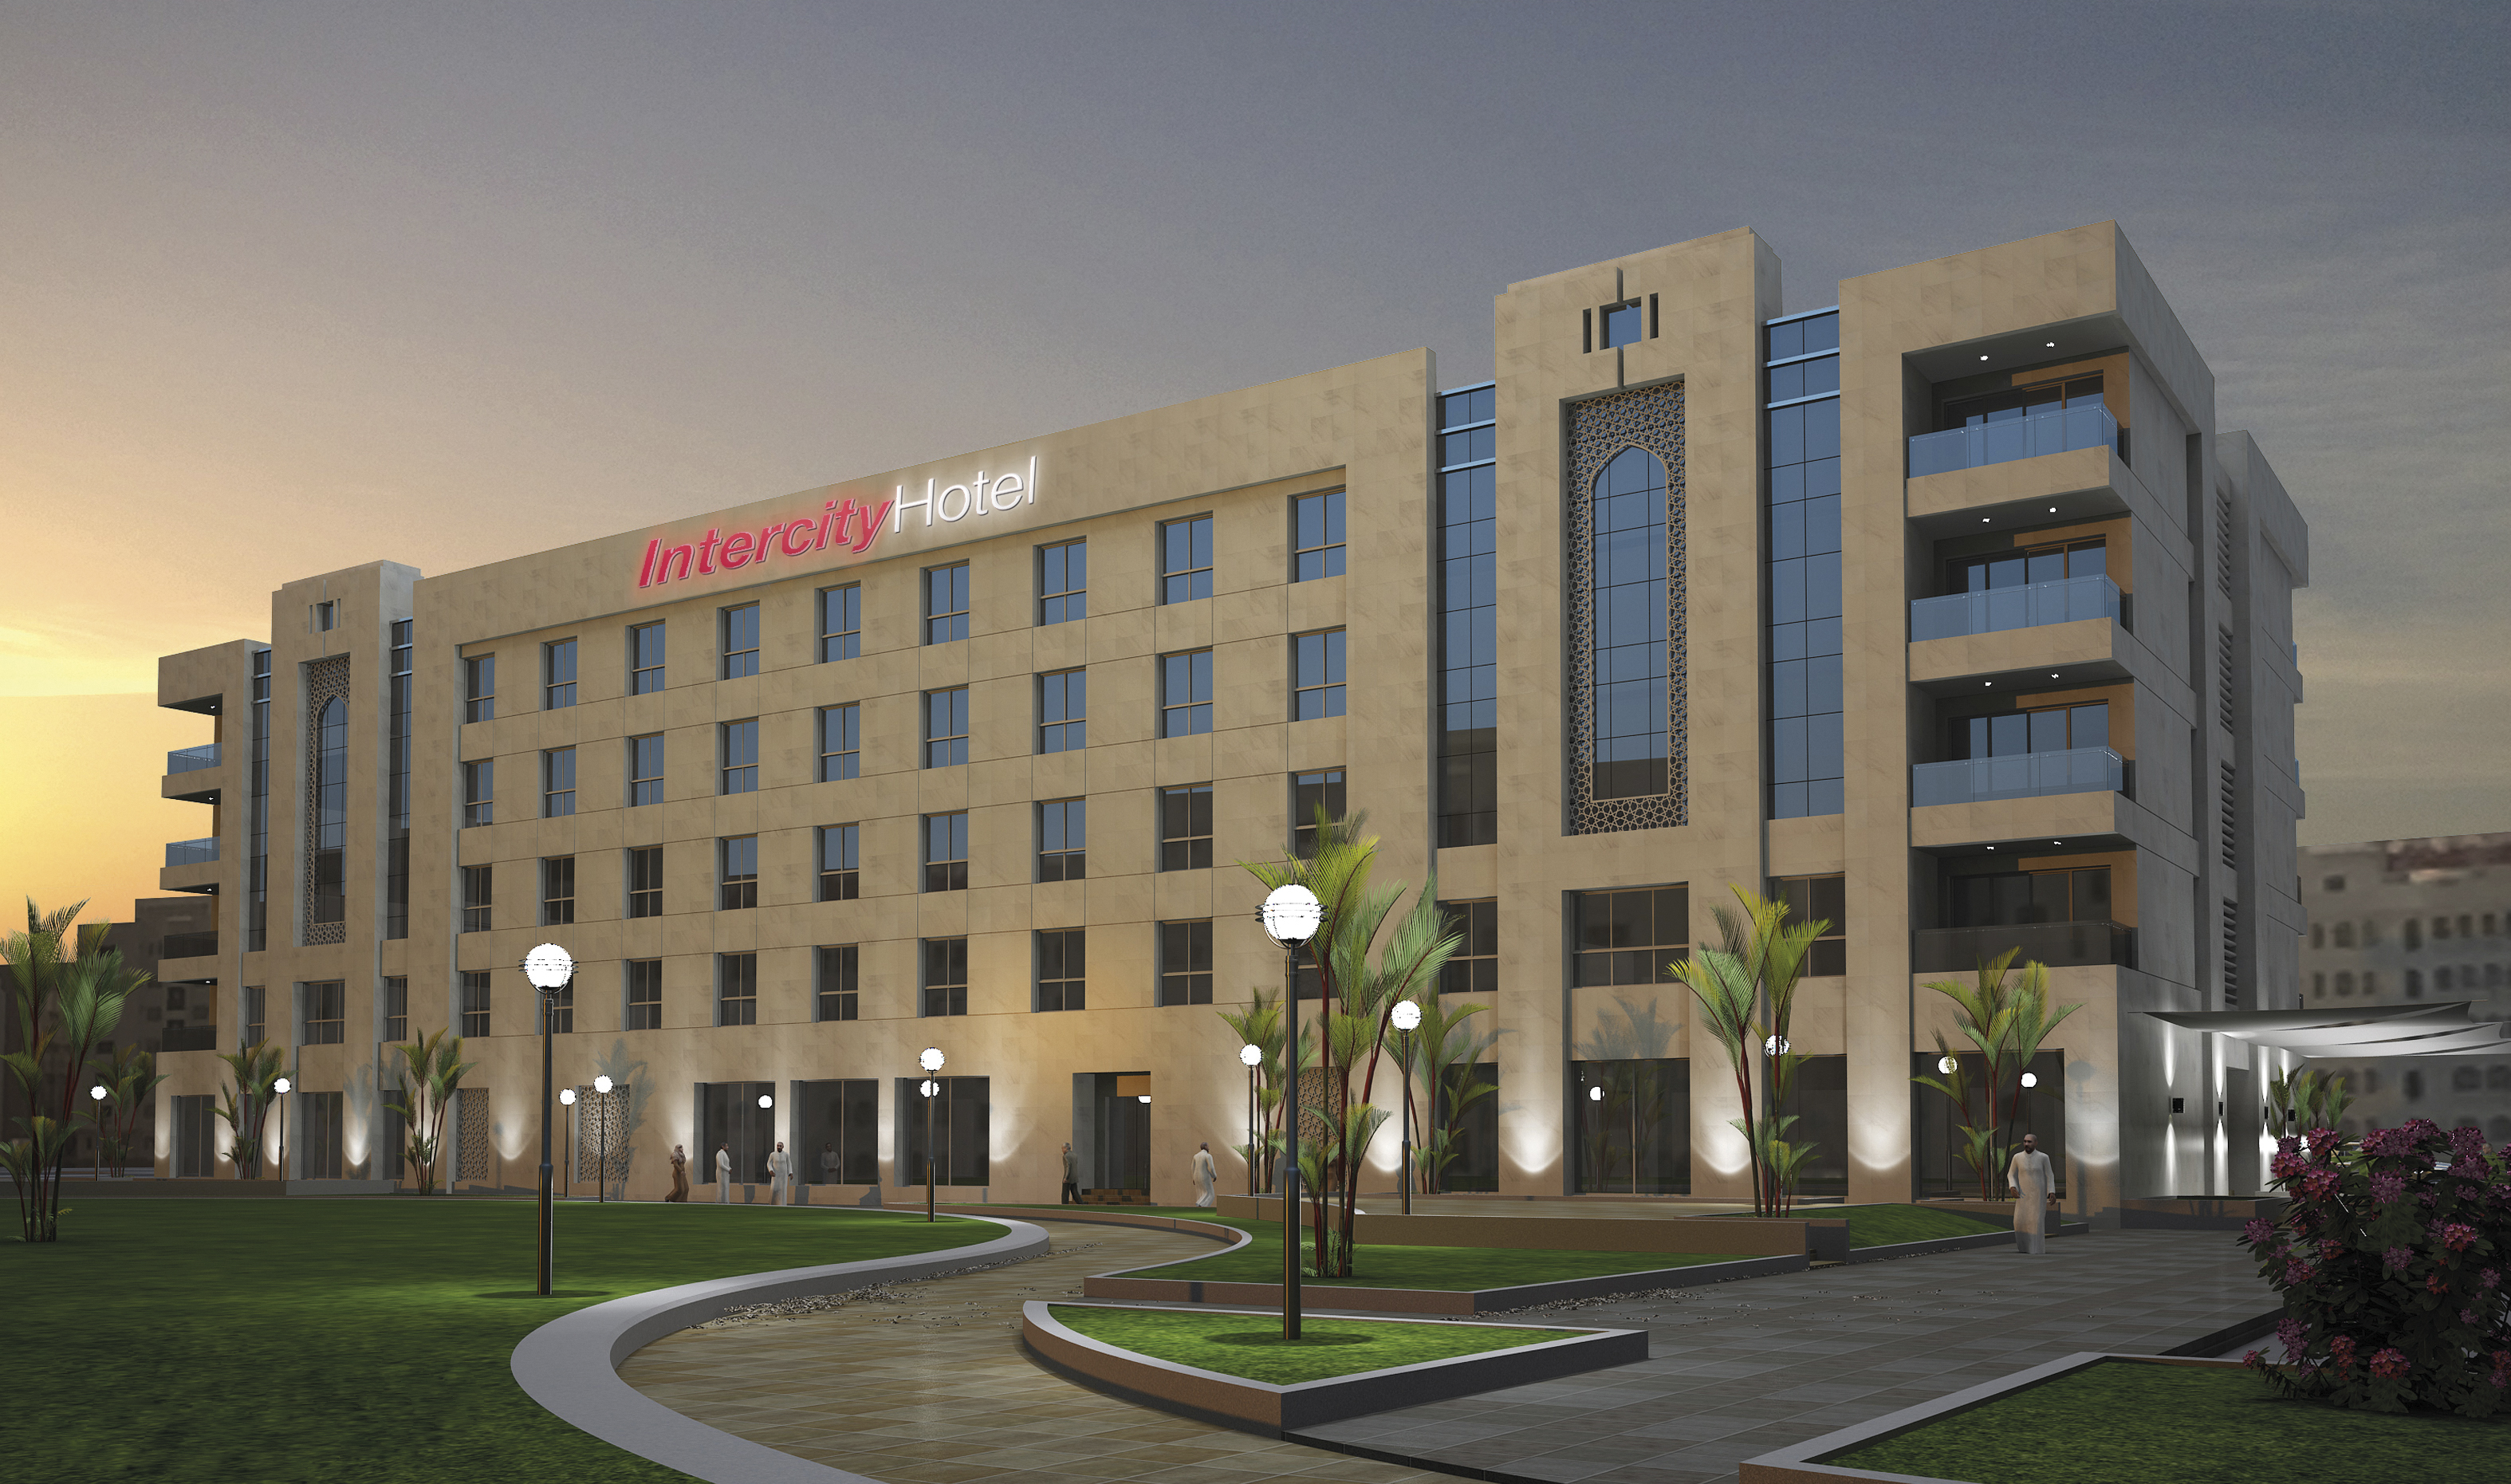 Deutsche hospitality signs agreement for an intercityhotel for Designhotel oman